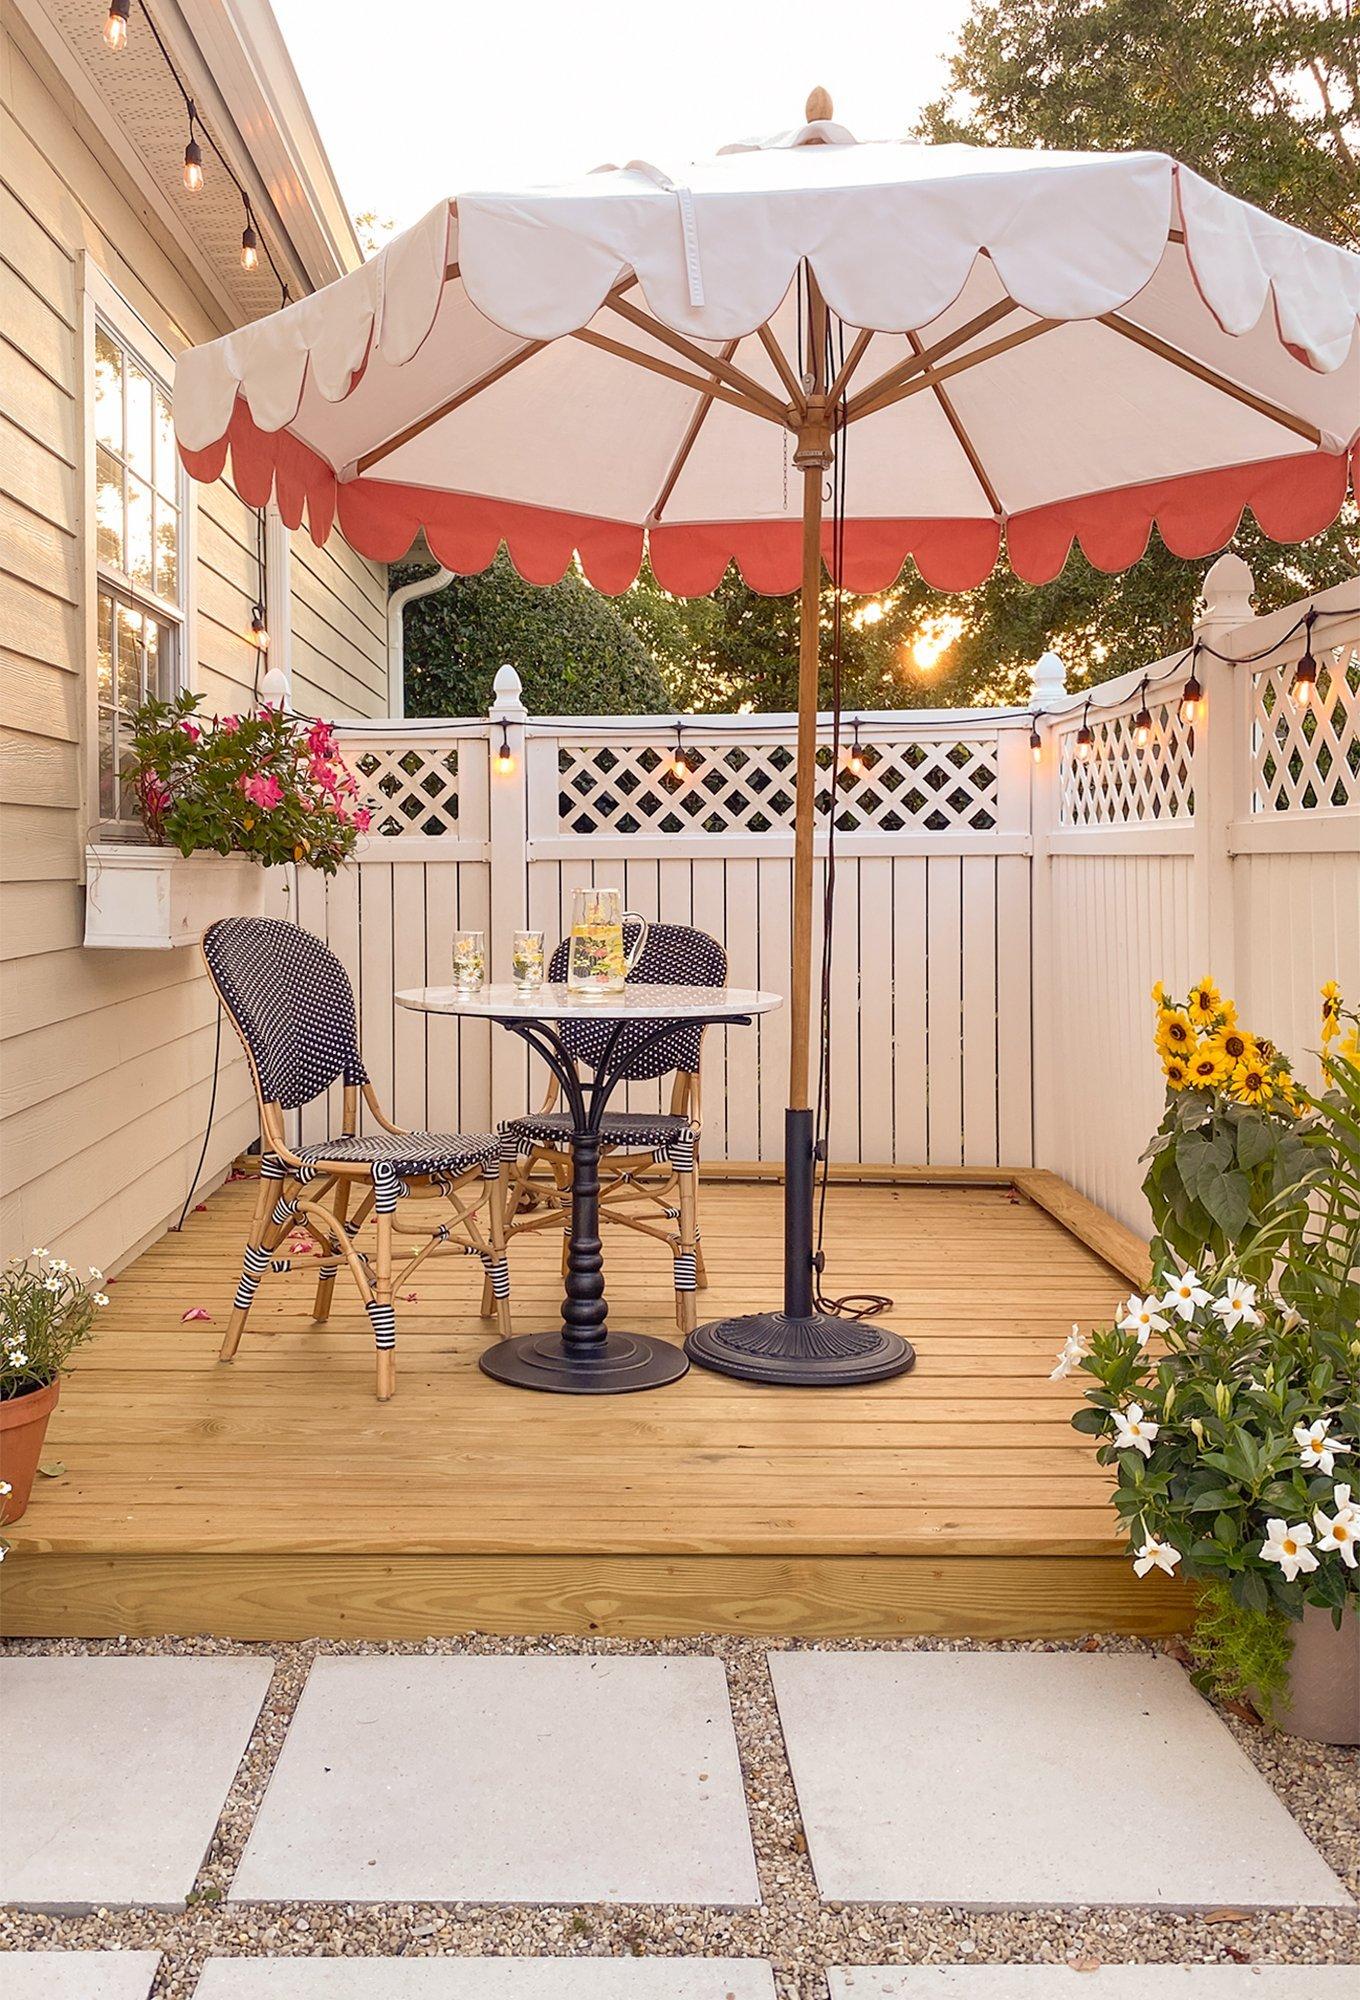 Ashley Brooke's backyard deck